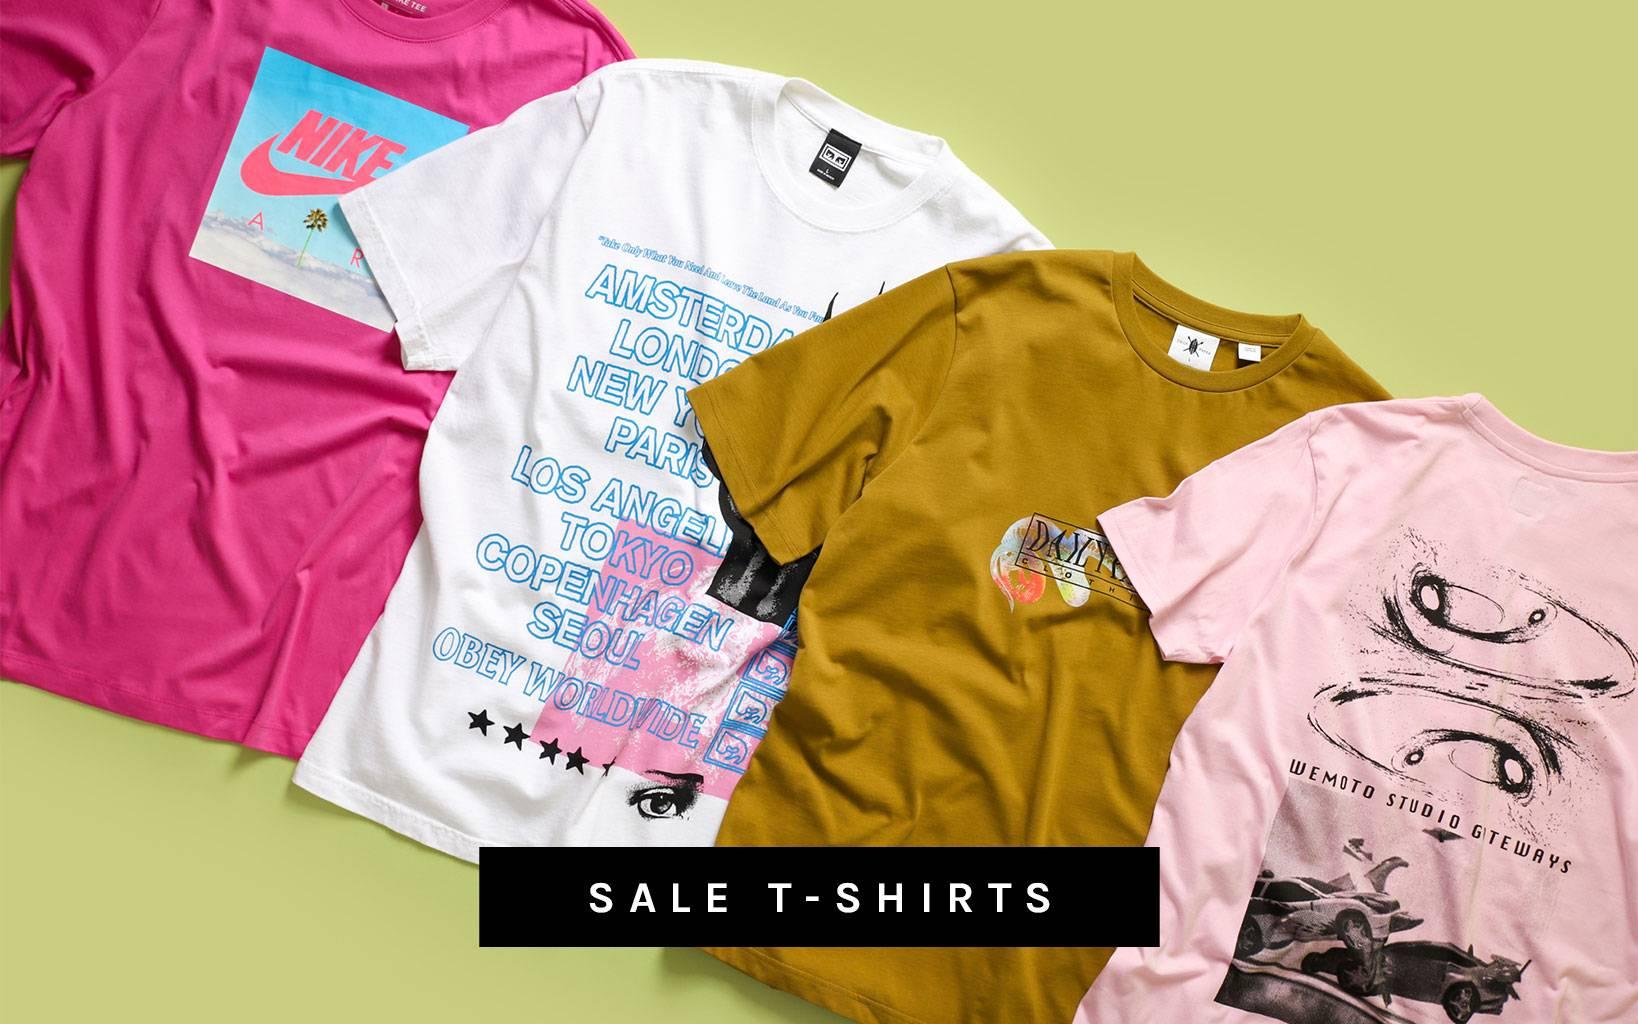 Sale T-shirts